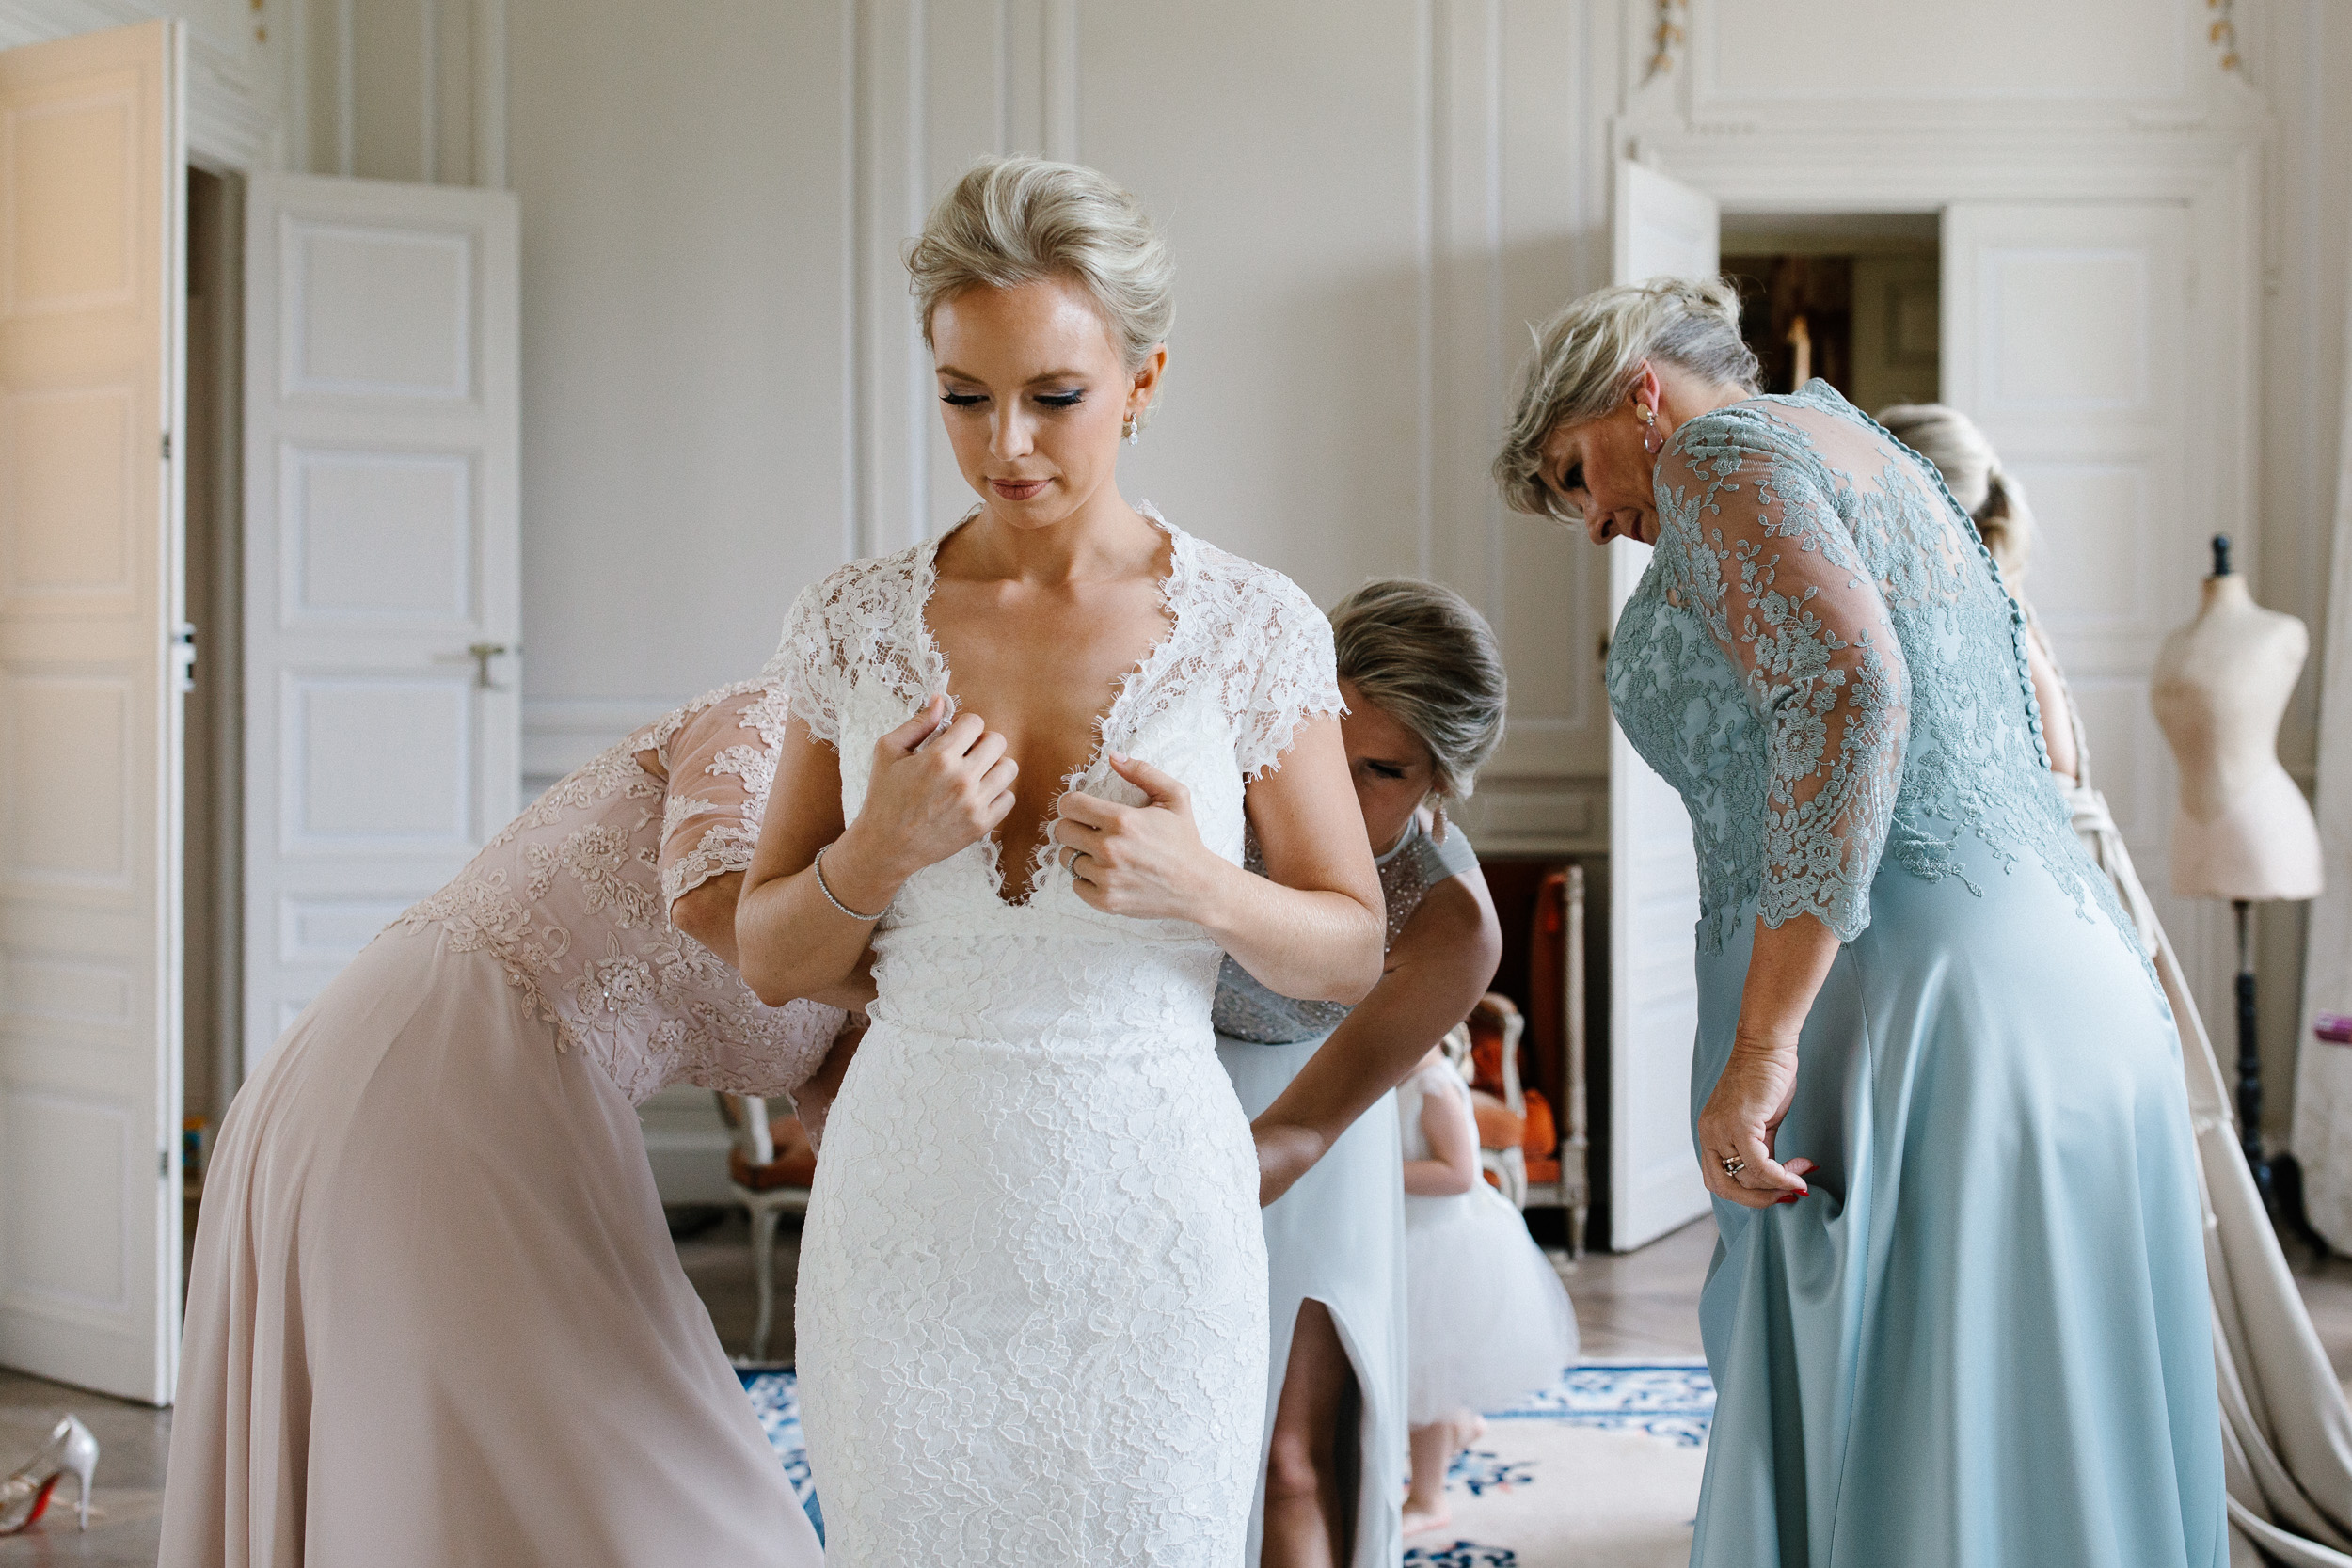 Wedding-Chateau-de-Varennes-033.jpg